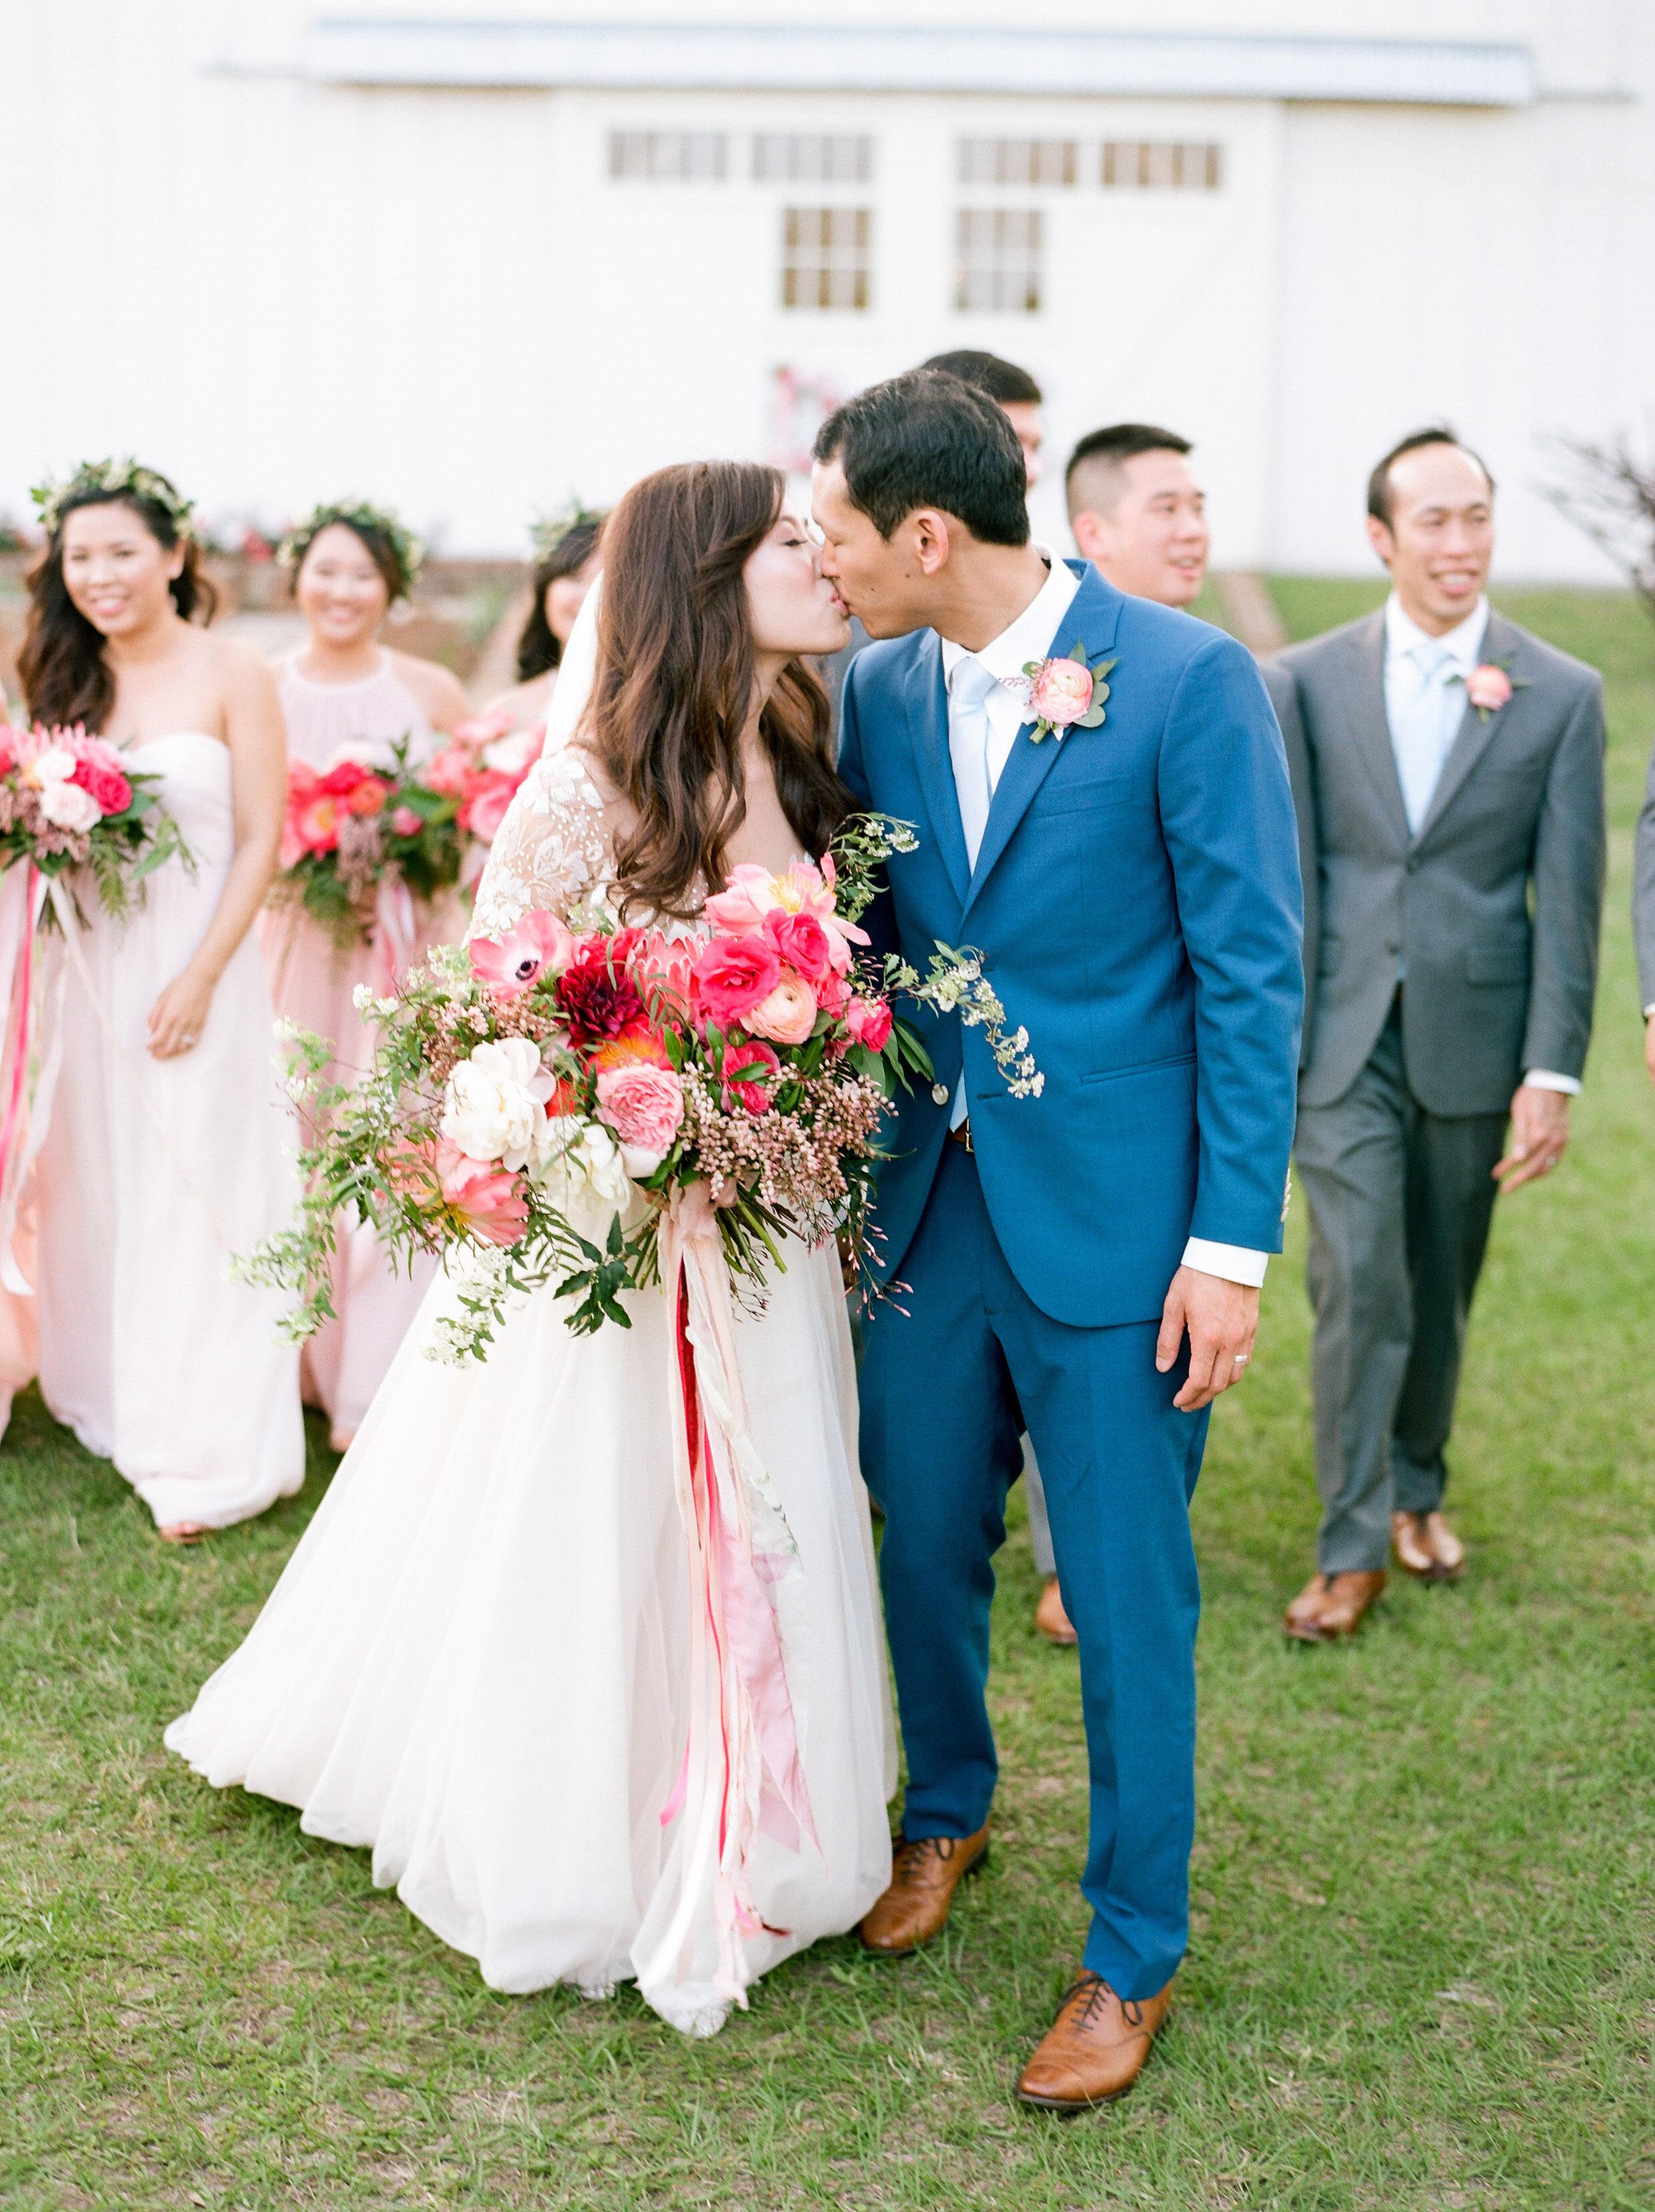 The-Knot-50-Weddings-50-States-Texas-Winner-Dana-Fernandez-photography-houston-wedding-photographer-film-fine-art-destination-23.jpg